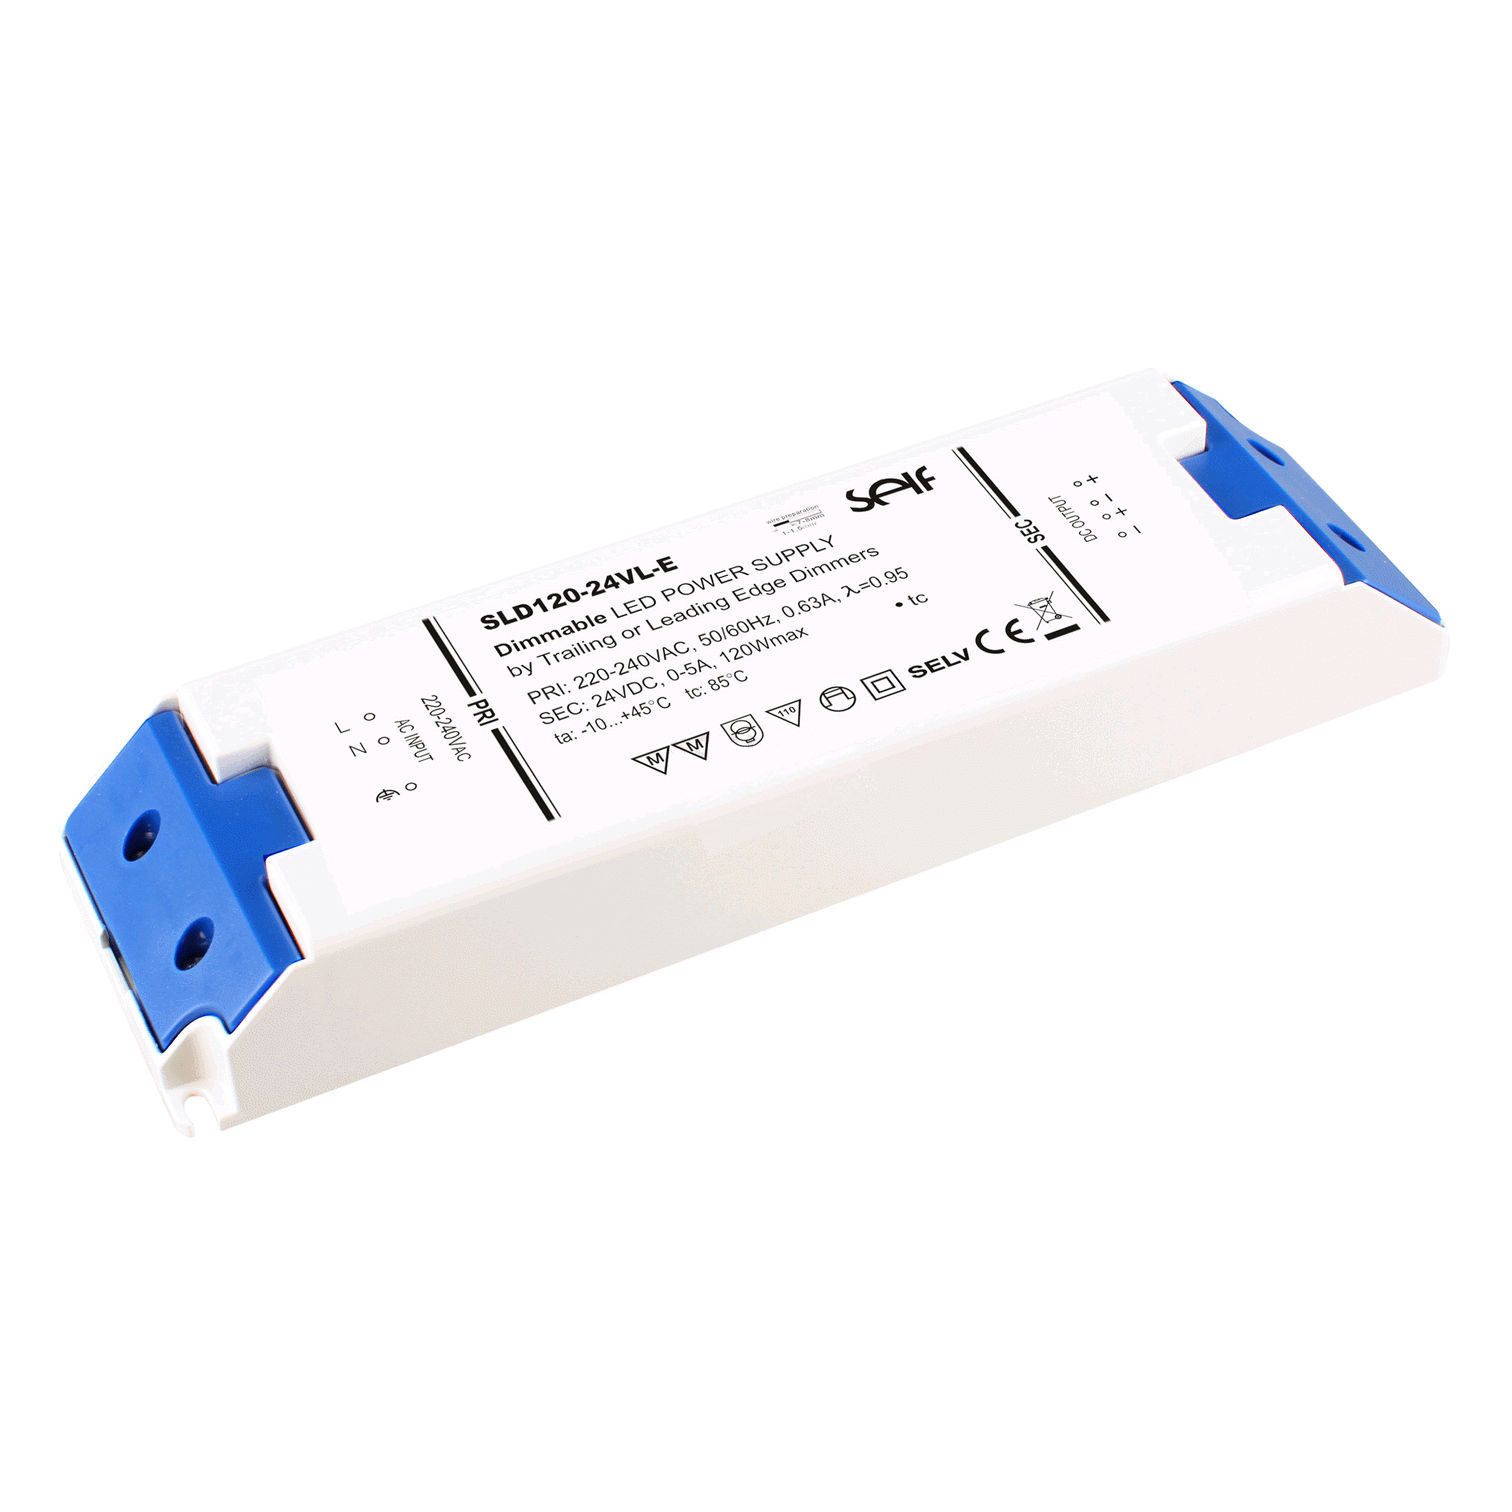 Self Electronics GmbH TRIAC dimmable Power supply 120 Watt SLD120